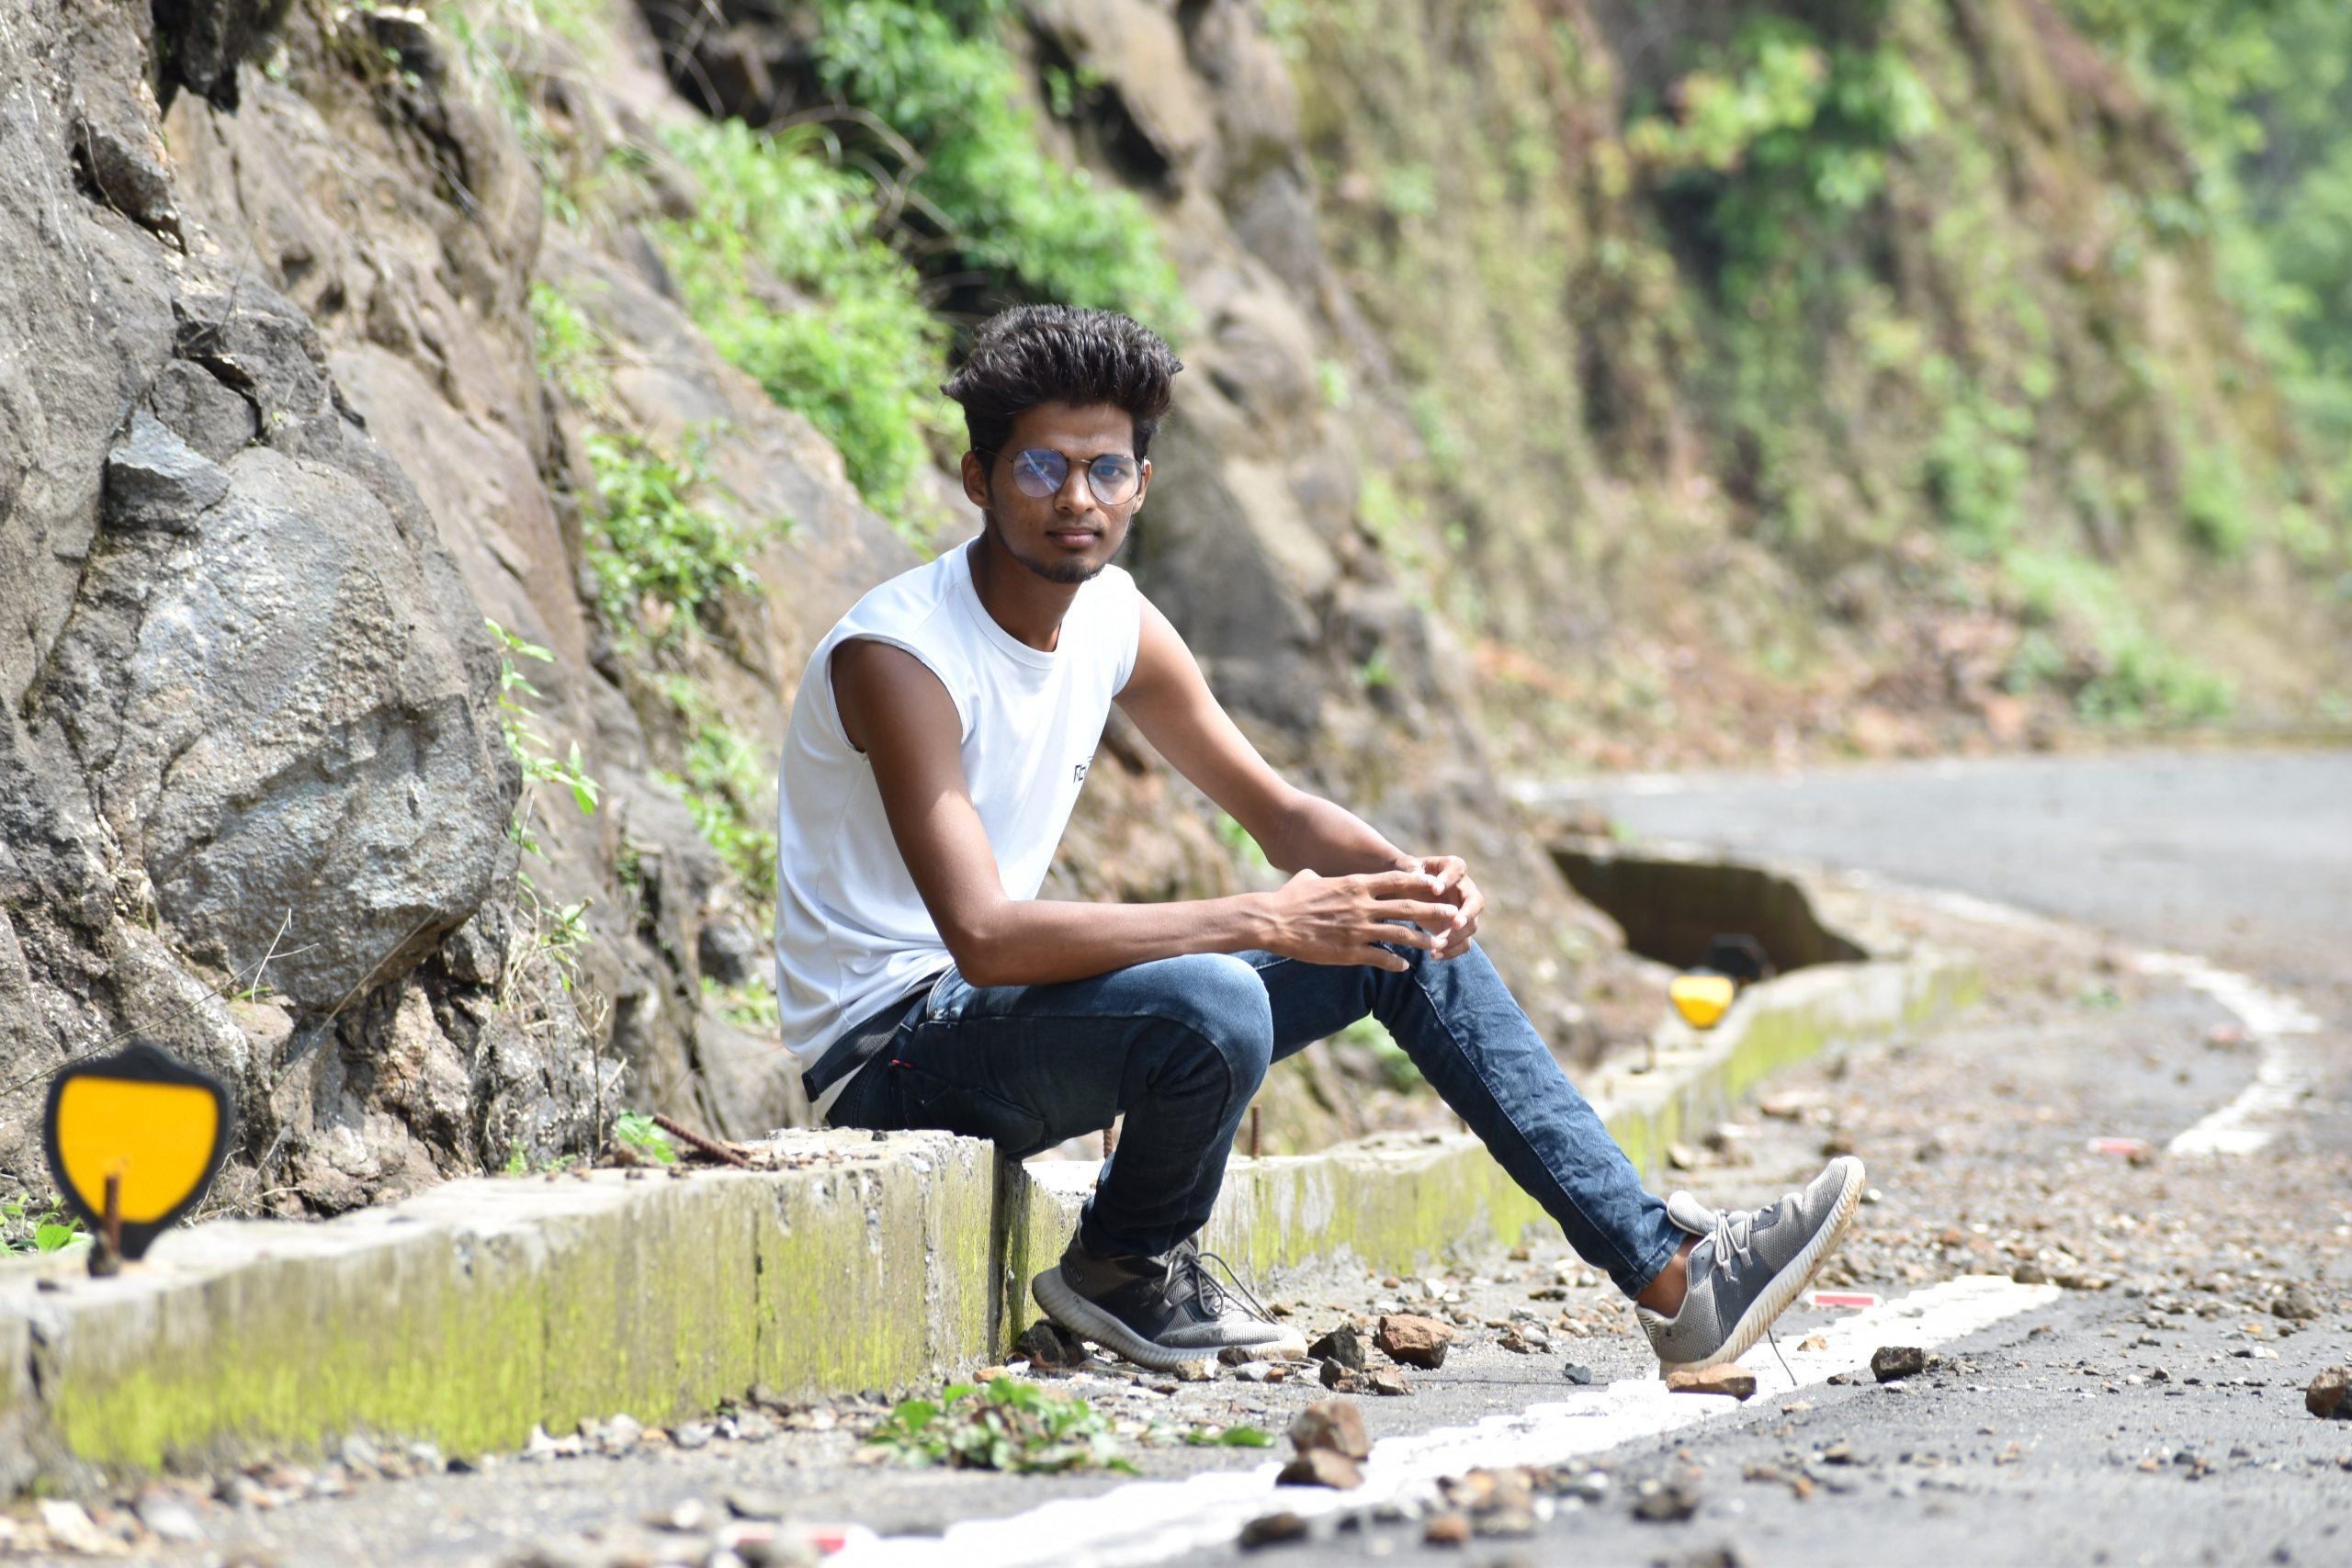 Boy sitting roadside